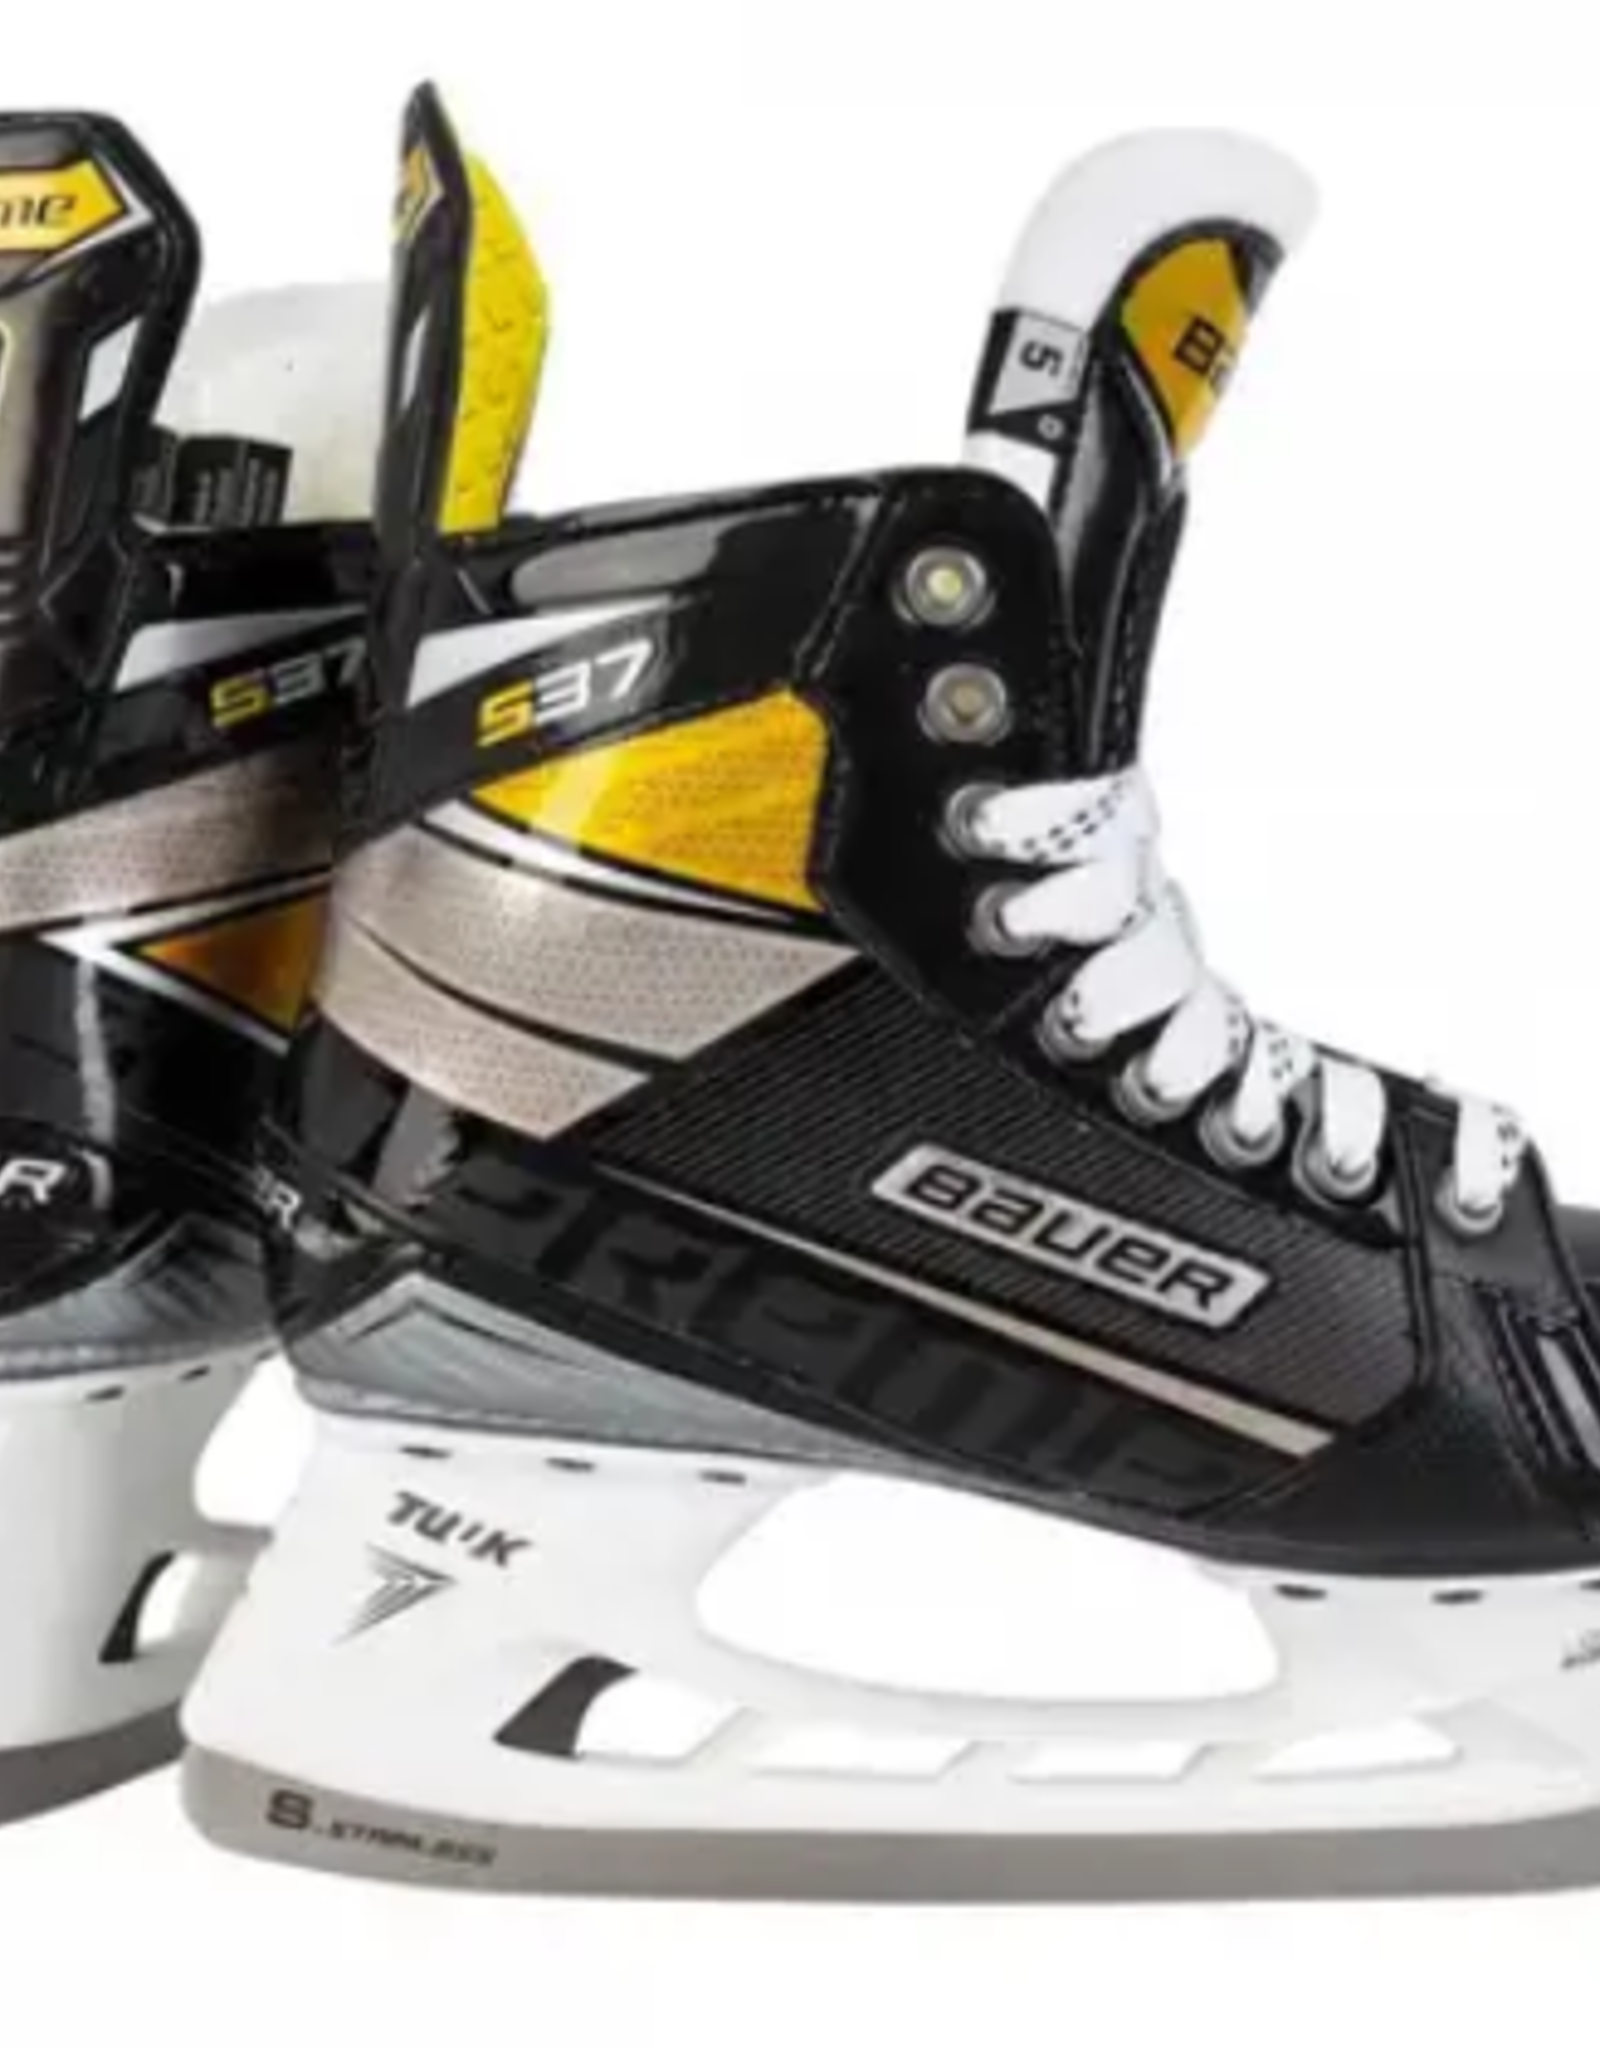 Bauer Hockey BTH20 SUPREME S37 SKATE - INT 2E 05.0